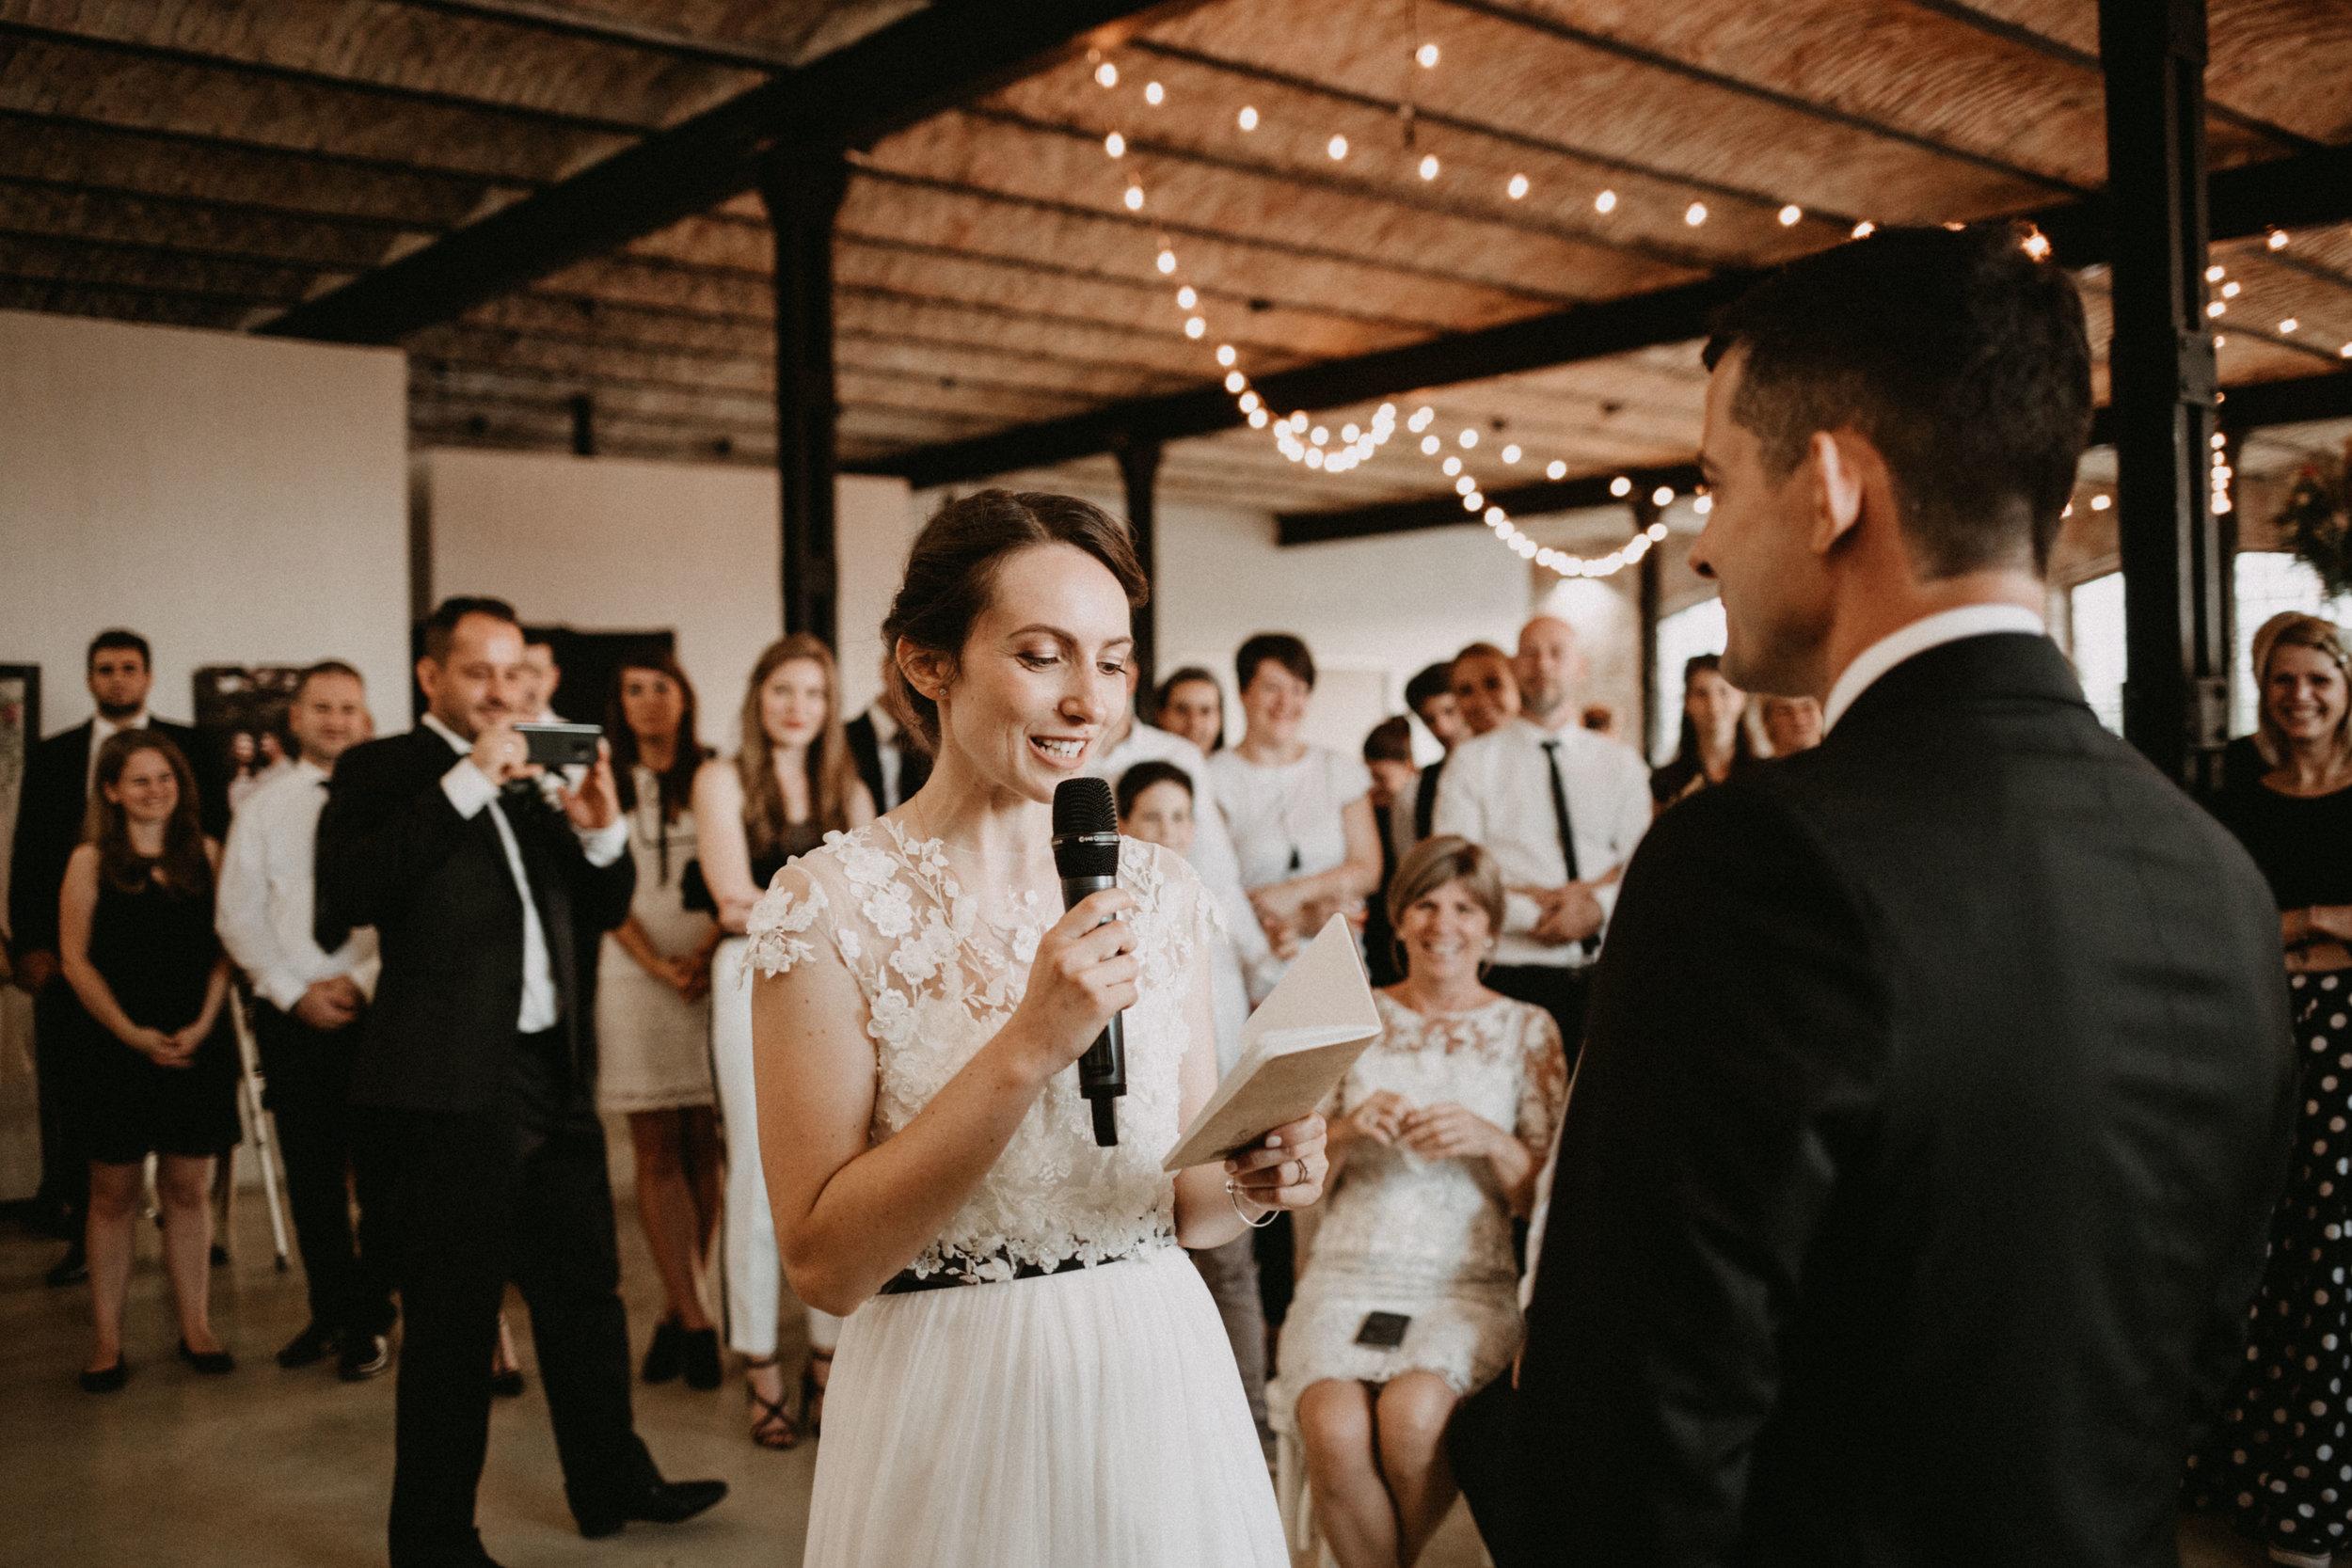 1826-Moni+Szabi-wedding-400-w.jpg